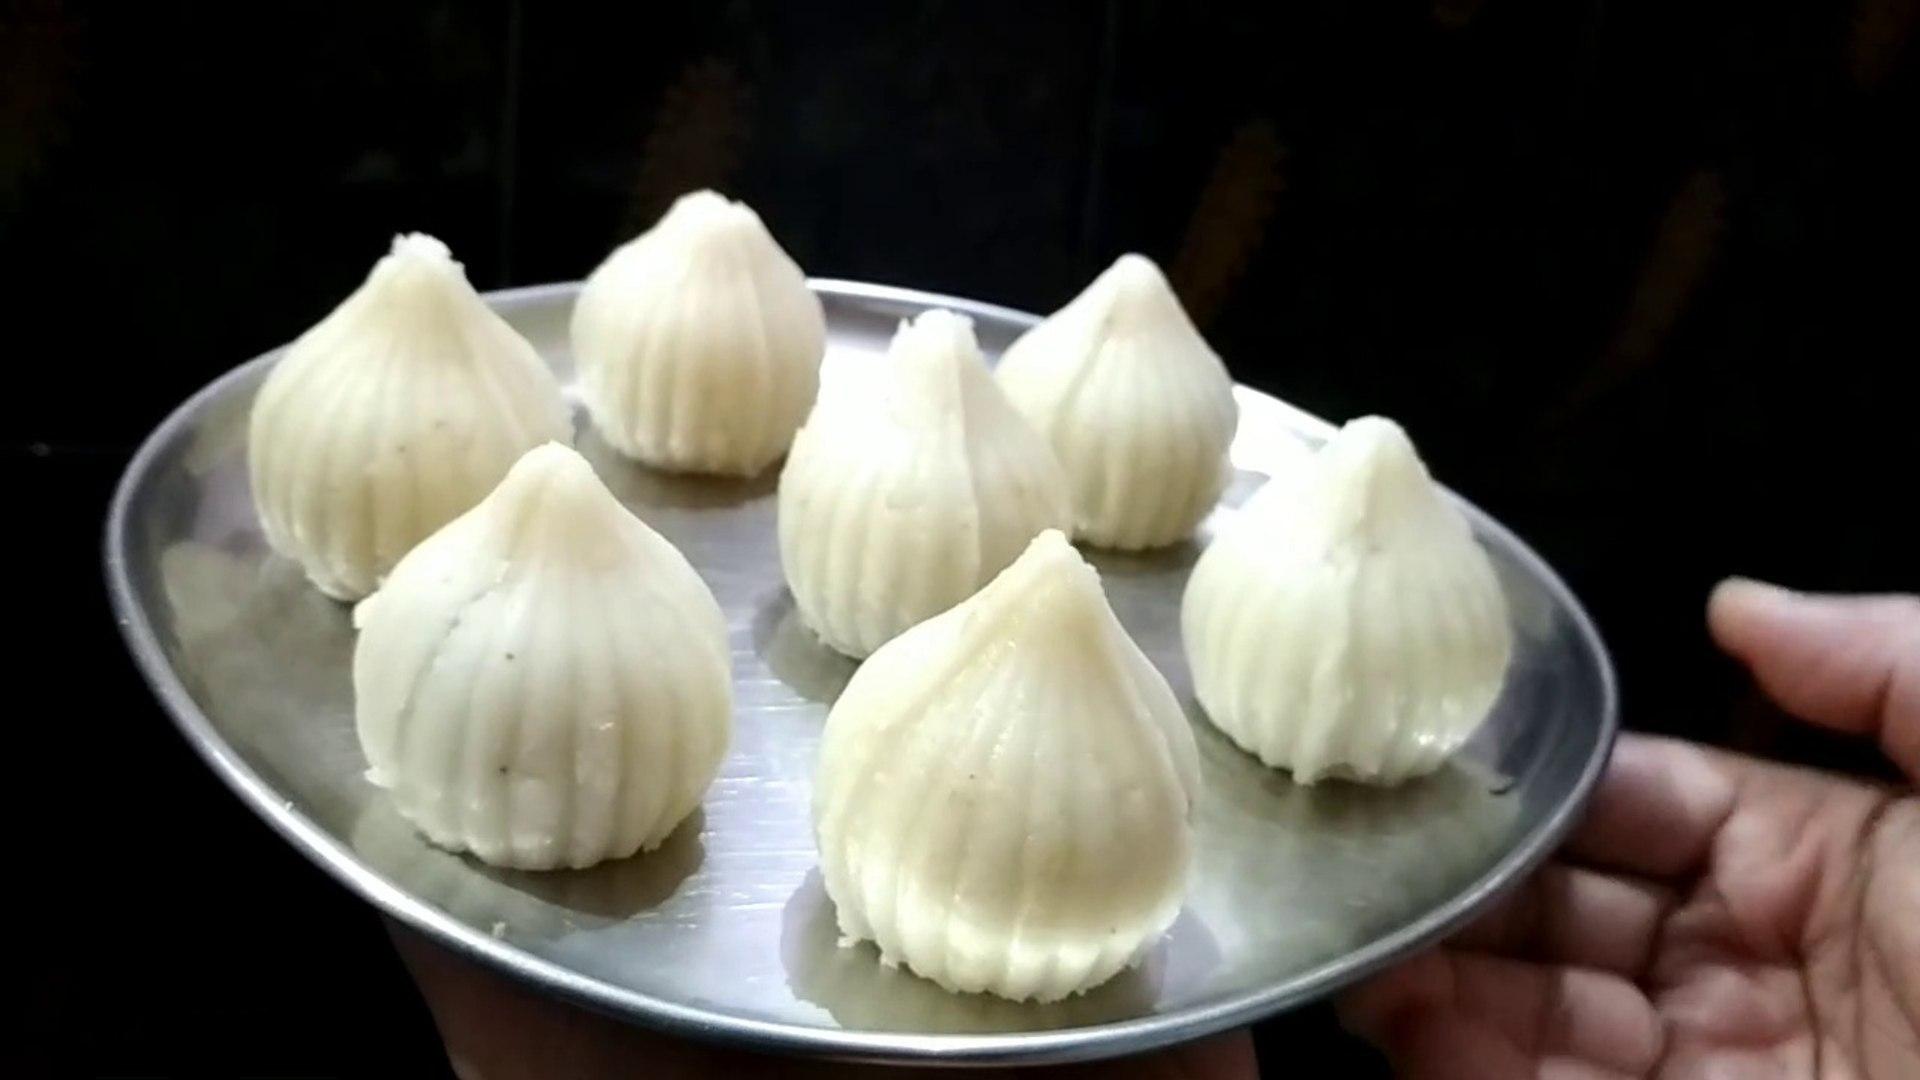 Modak, Recipe, Modak recipe, Modak recipe in hindi, Modak recipe by sanjeev kapoor, Modak recipe by